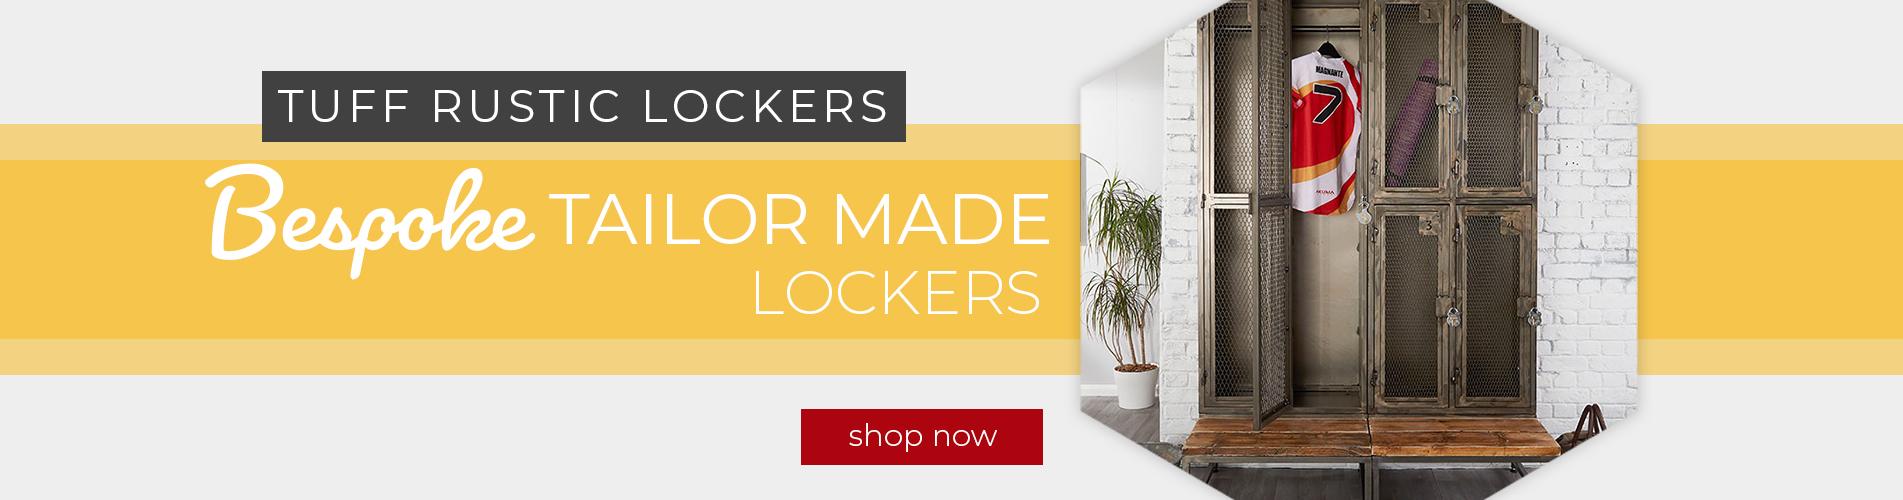 Tuff Rustic Lockers